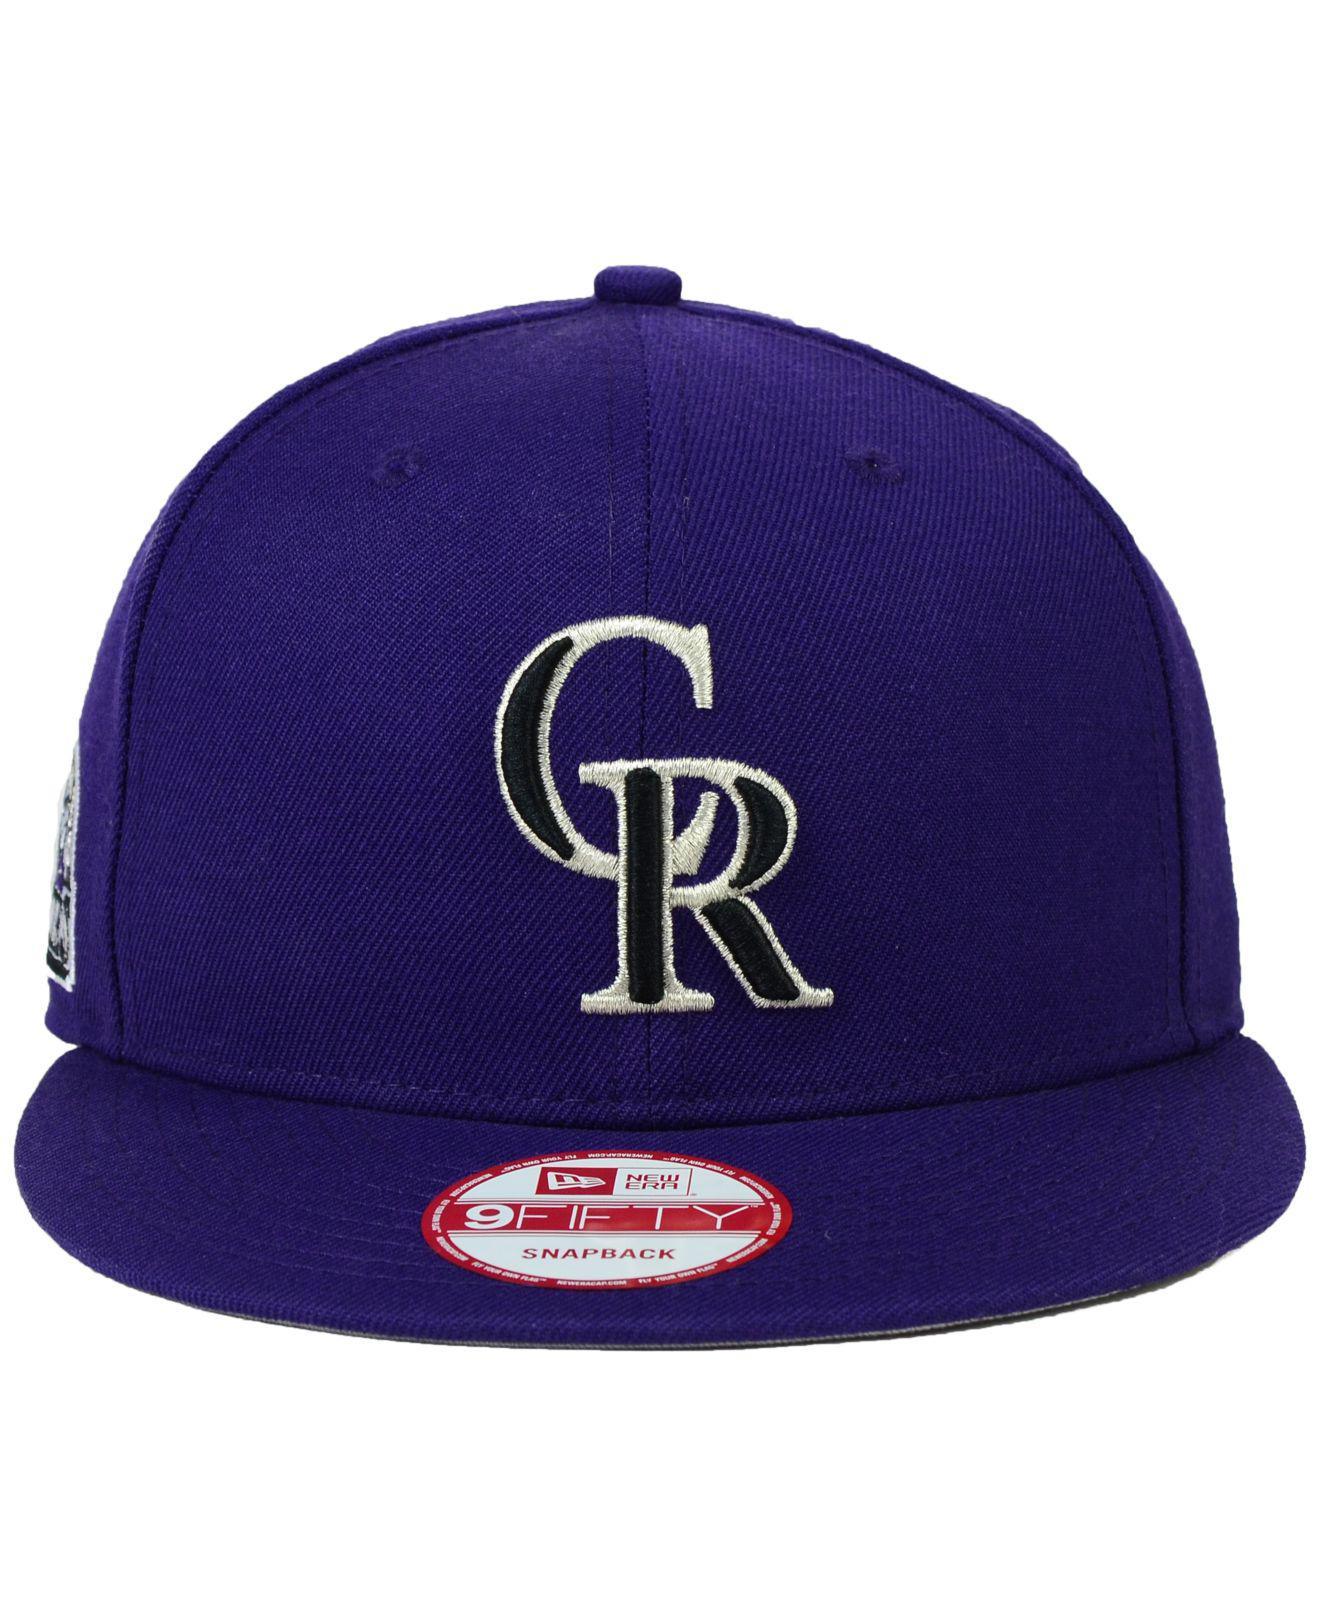 sports shoes 87892 bb8fb sale lyst ktz colorado rockies 2 tone link 9fifty snapback cap in purple  for men 6b307